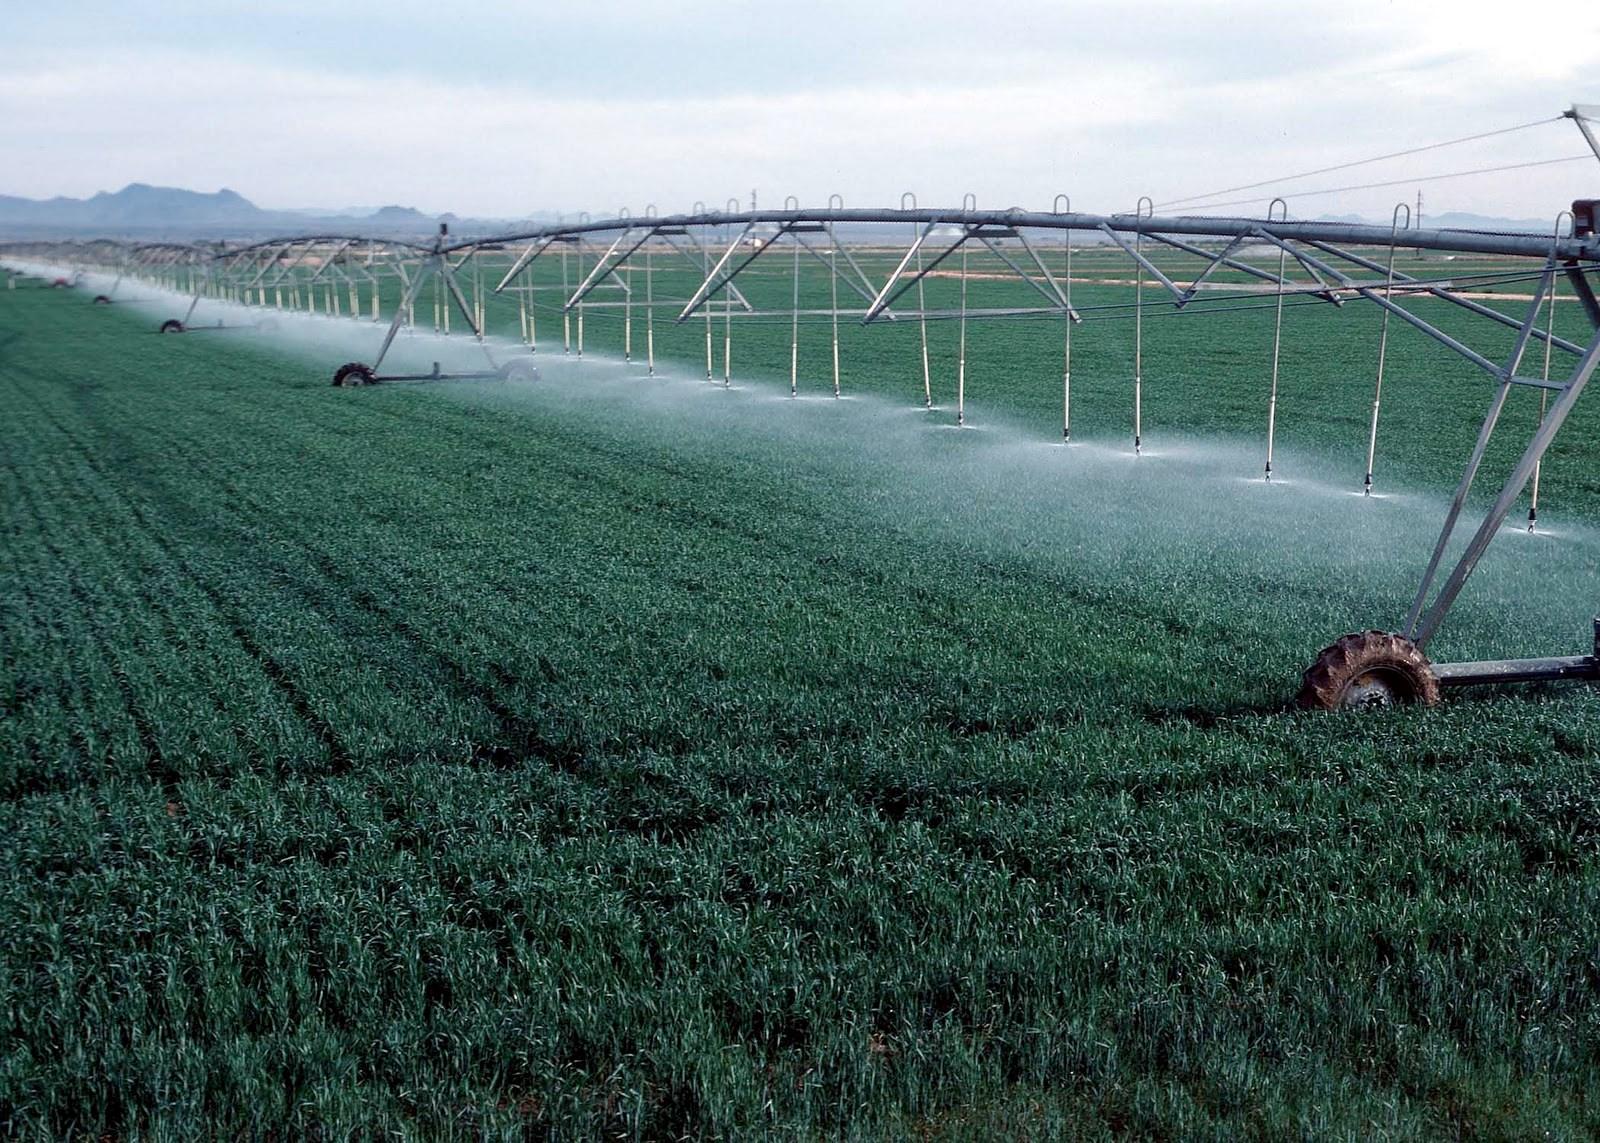 New Center Pivot 150 Acre Farm  Estancia Valley, NM For Sale